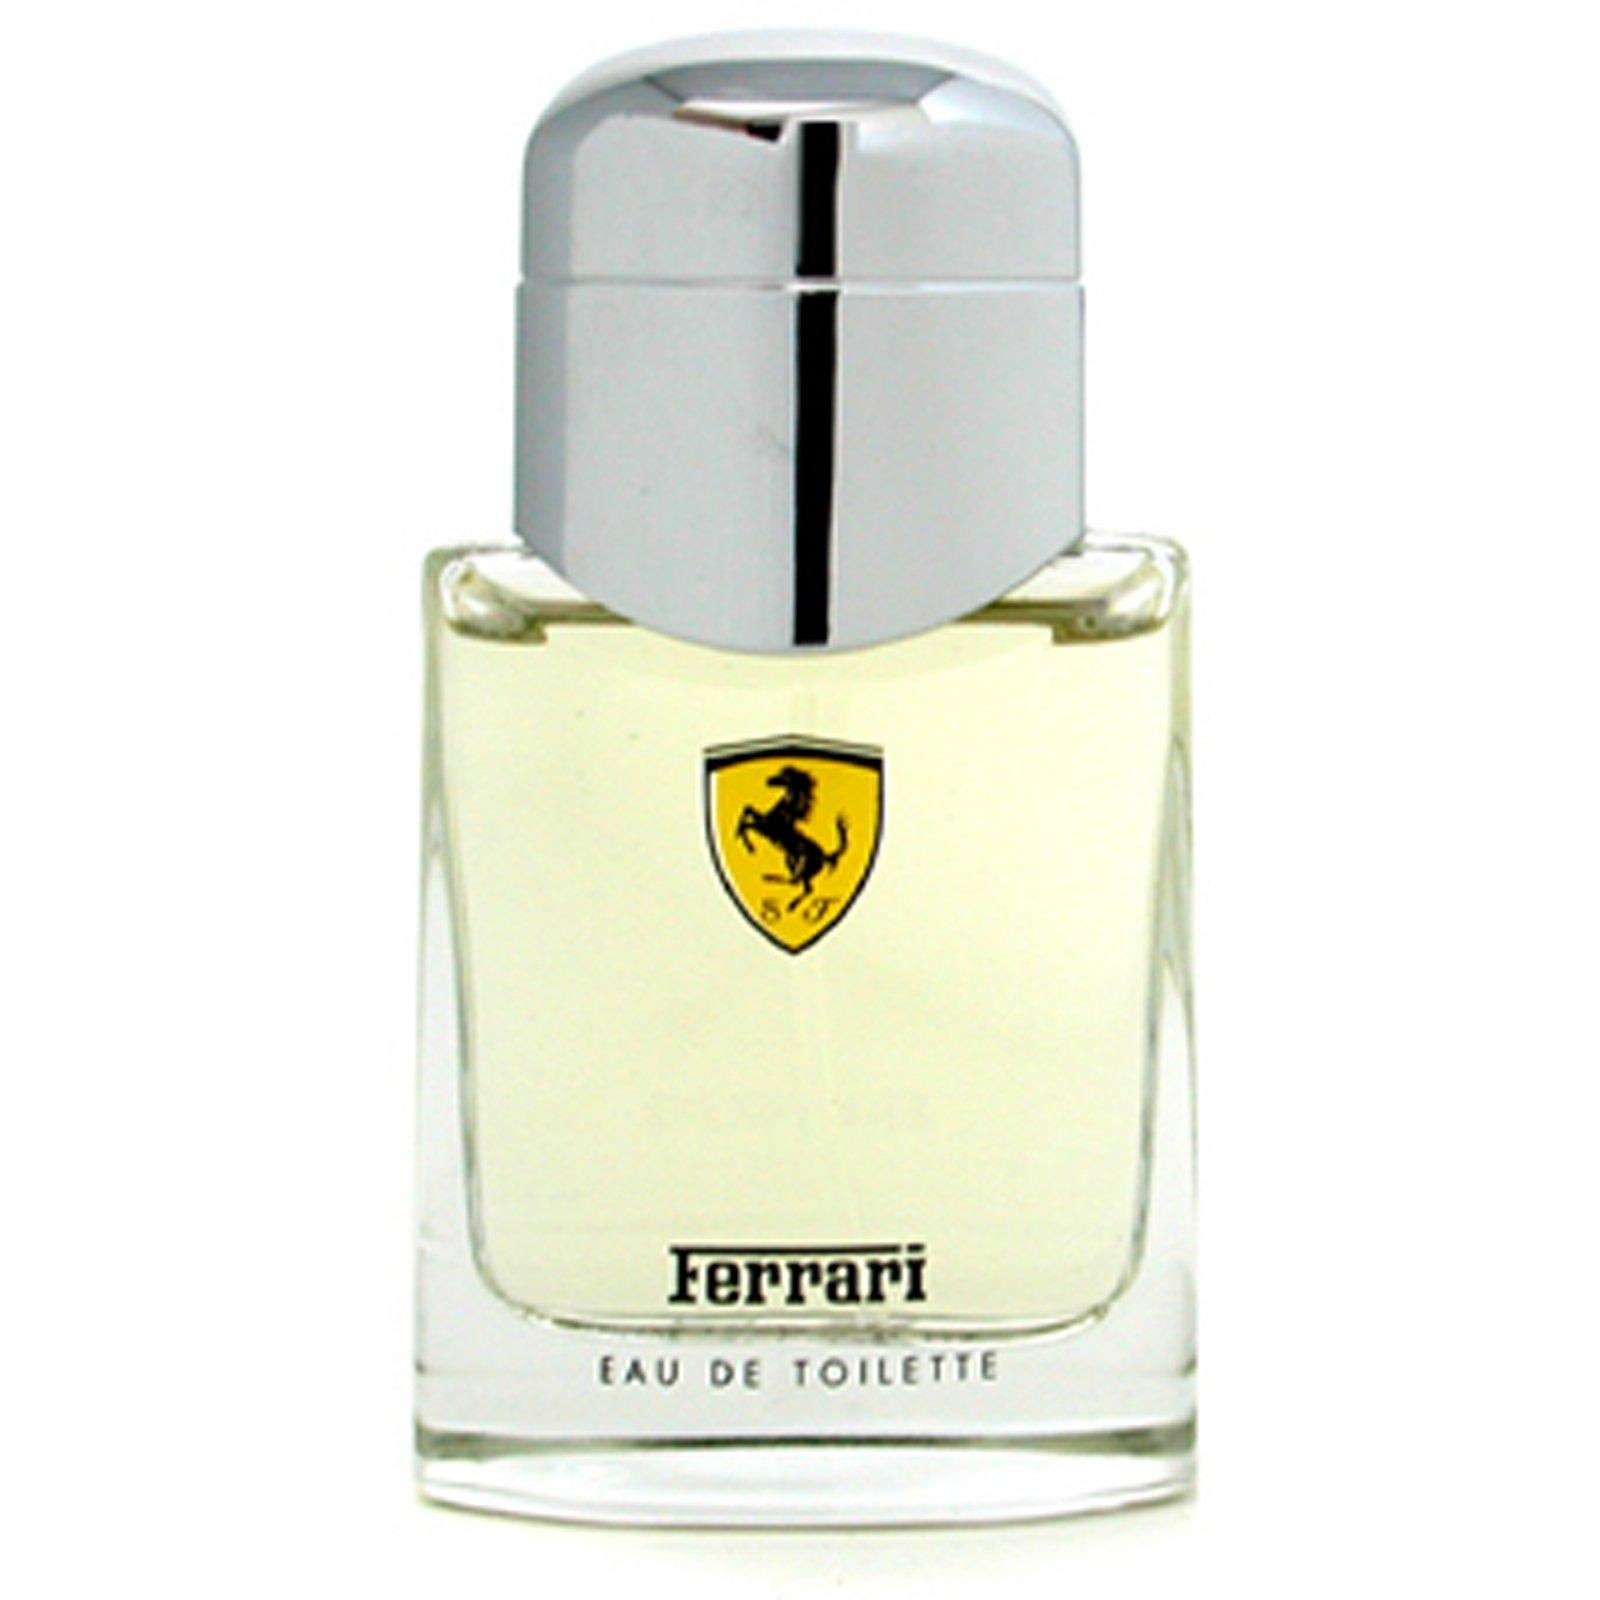 perfume ferrari scuderia red masculino edt 125 ml 5173 2000 62910